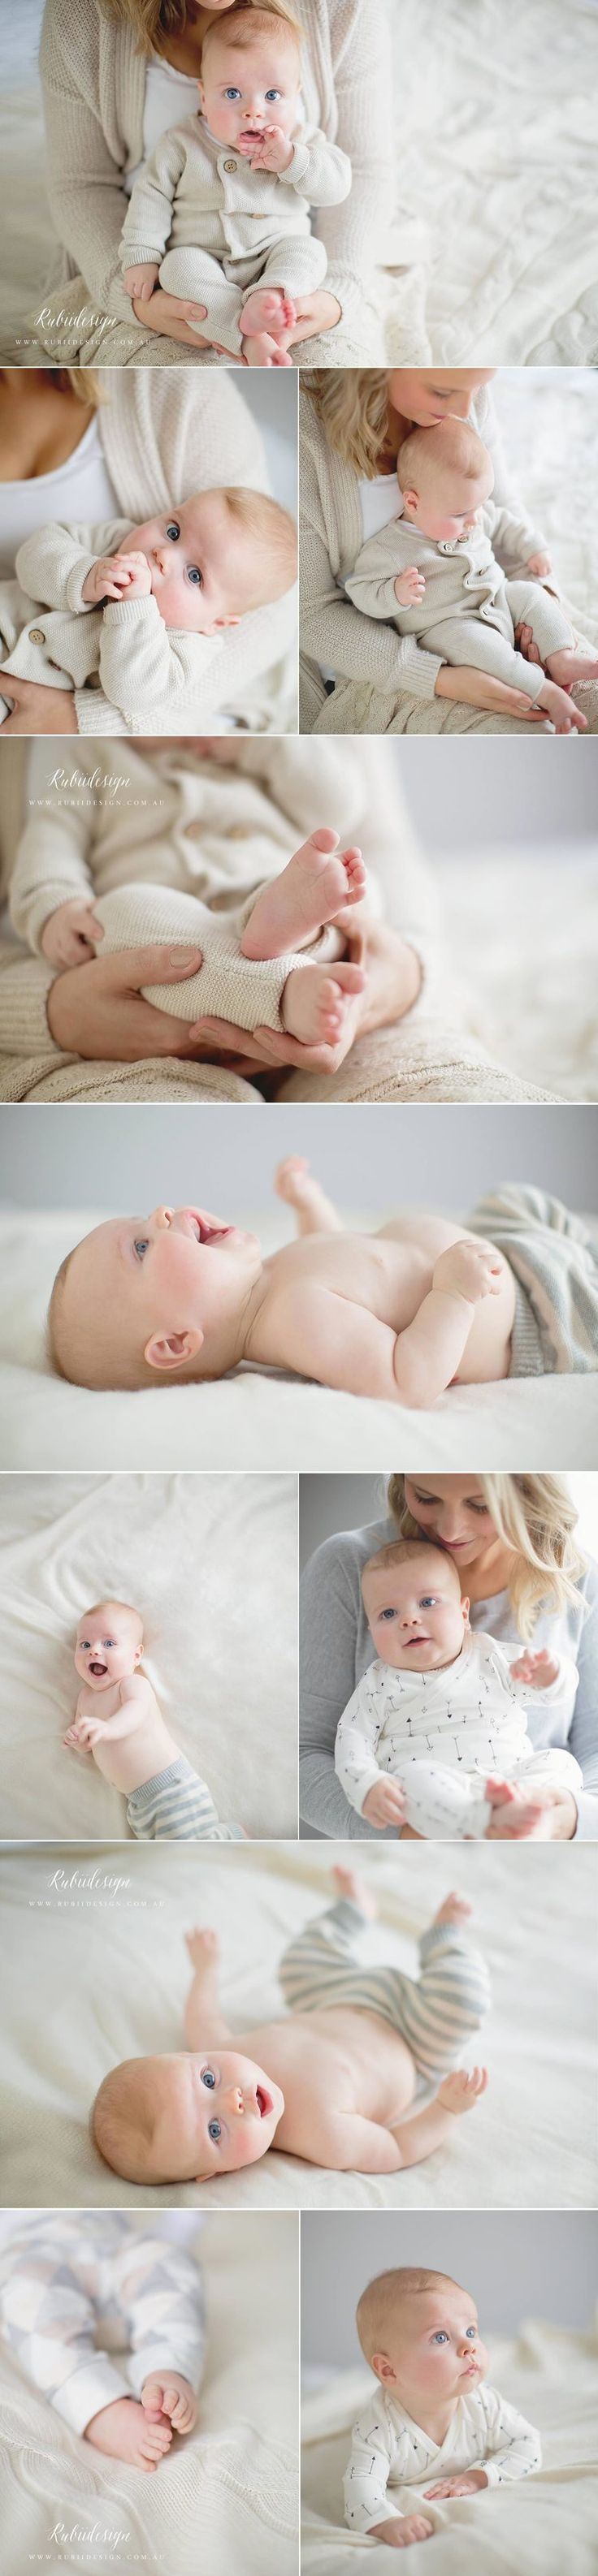 {lennon roy - 5 months} — rubiidesign - newborn photographer - bendigo